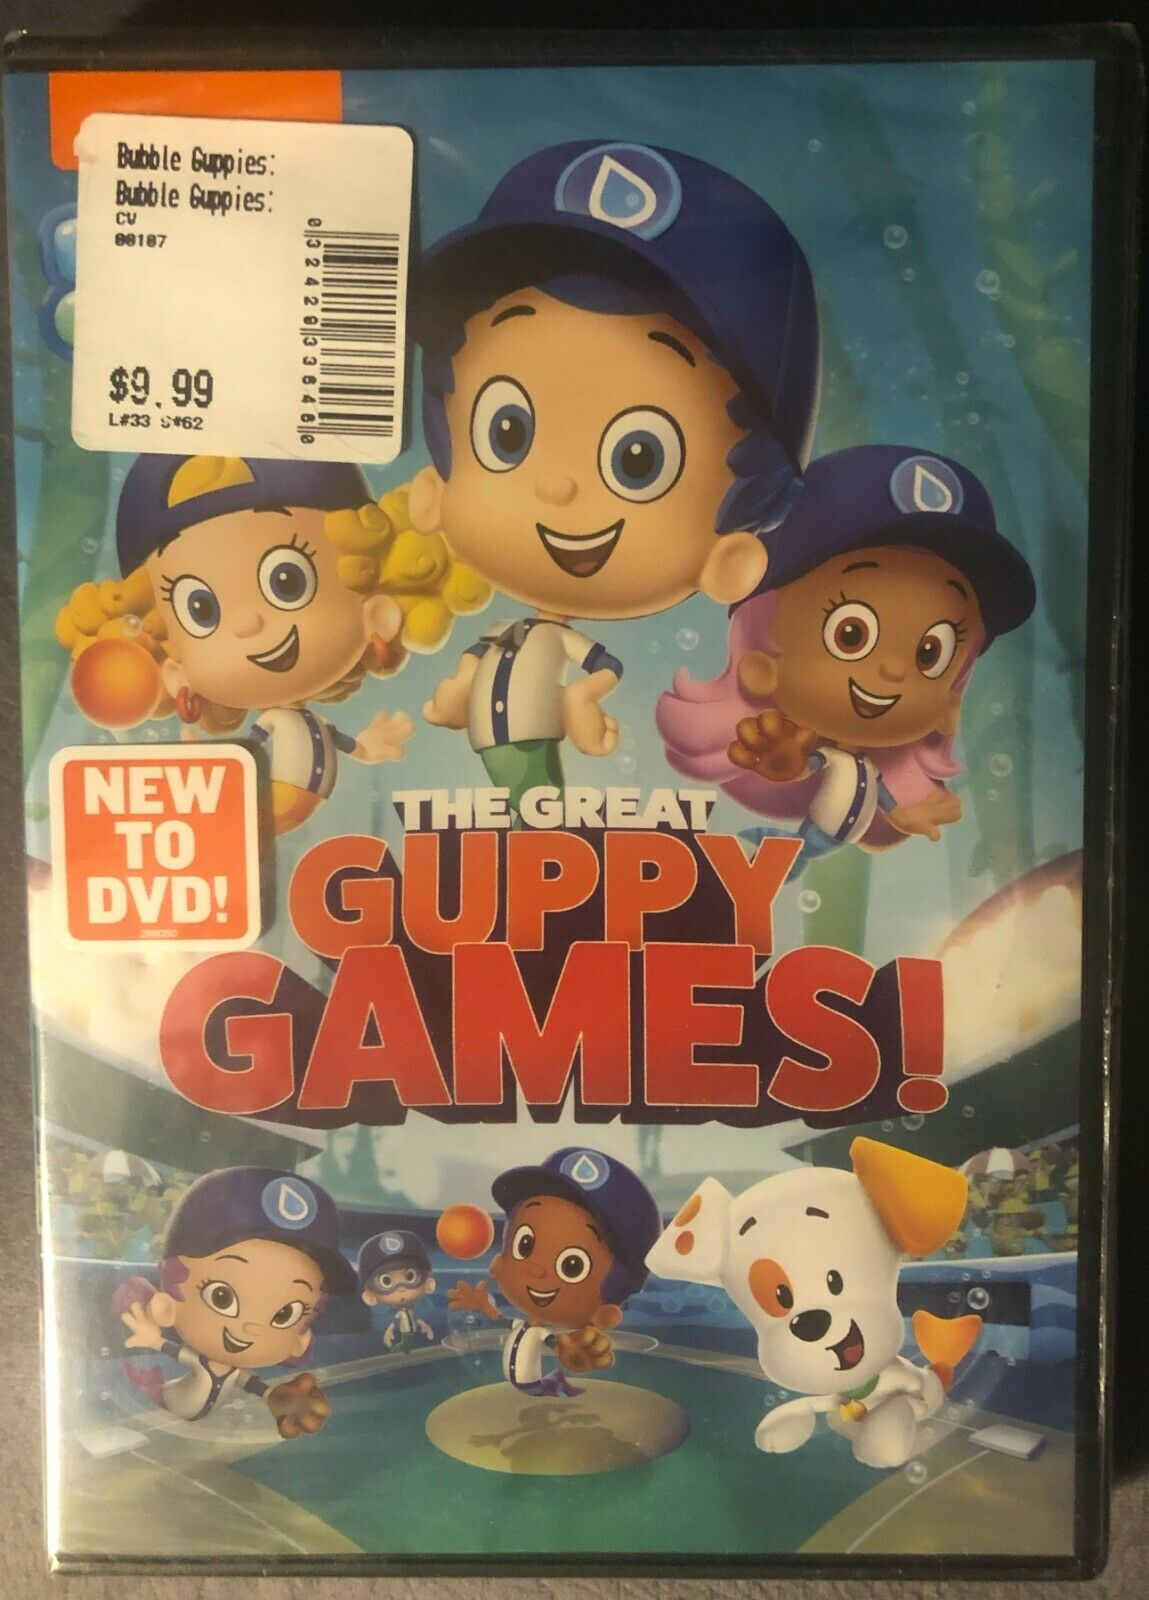 New Bubble Guppies : bubble, guppies, Bubble, Guppies, Great, Guppy, Games, EDIZIONE, Stati, Uniti, Online